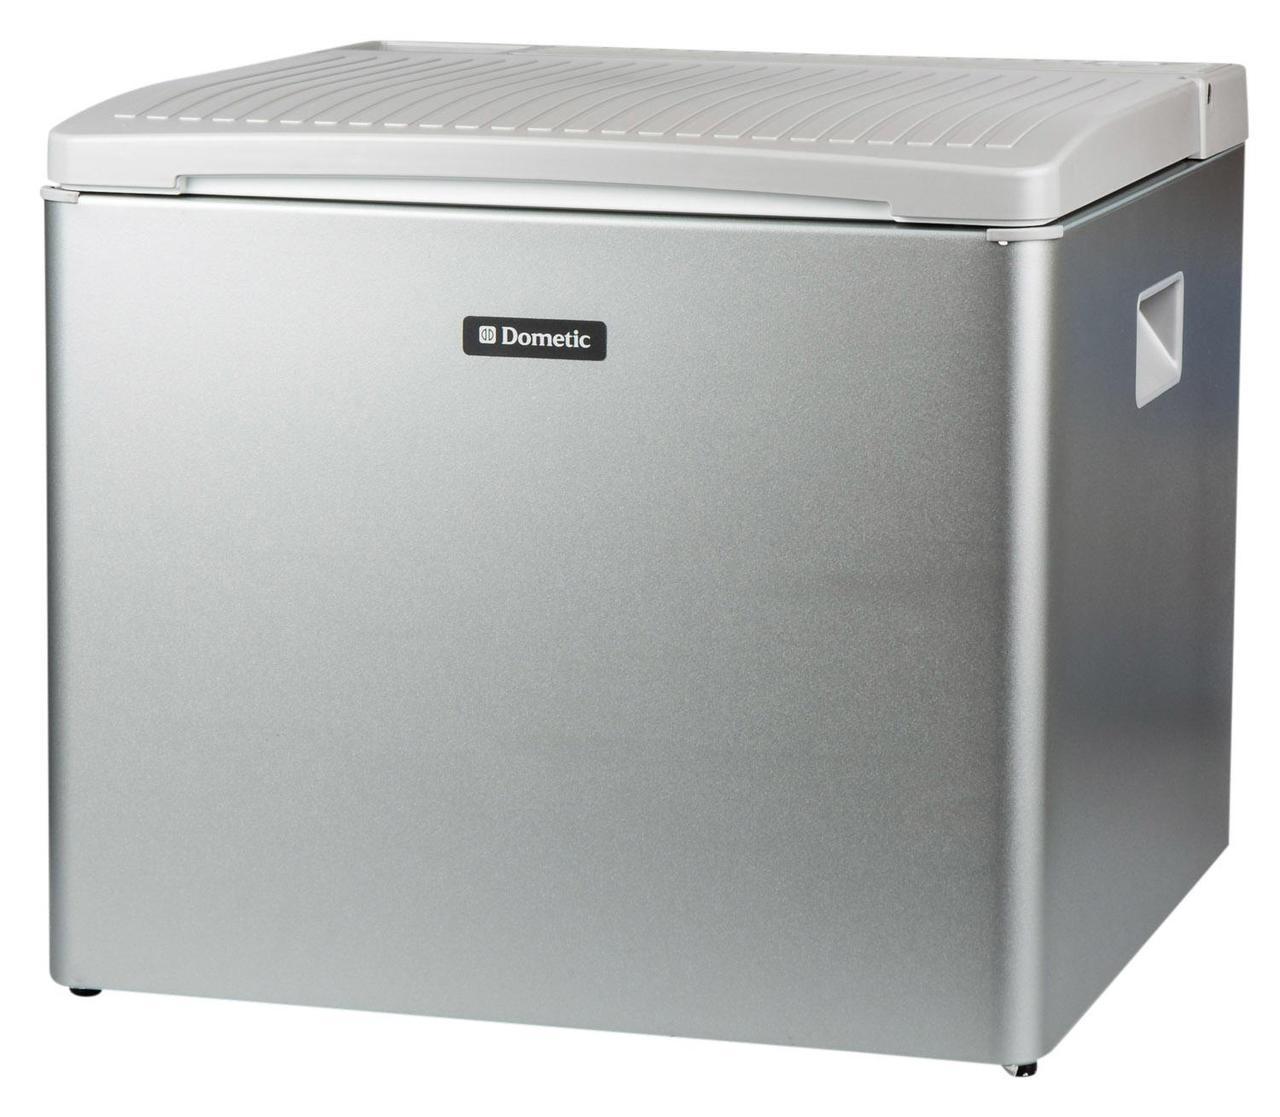 portable camping fridge 3 way silent fridges and cool. Black Bedroom Furniture Sets. Home Design Ideas